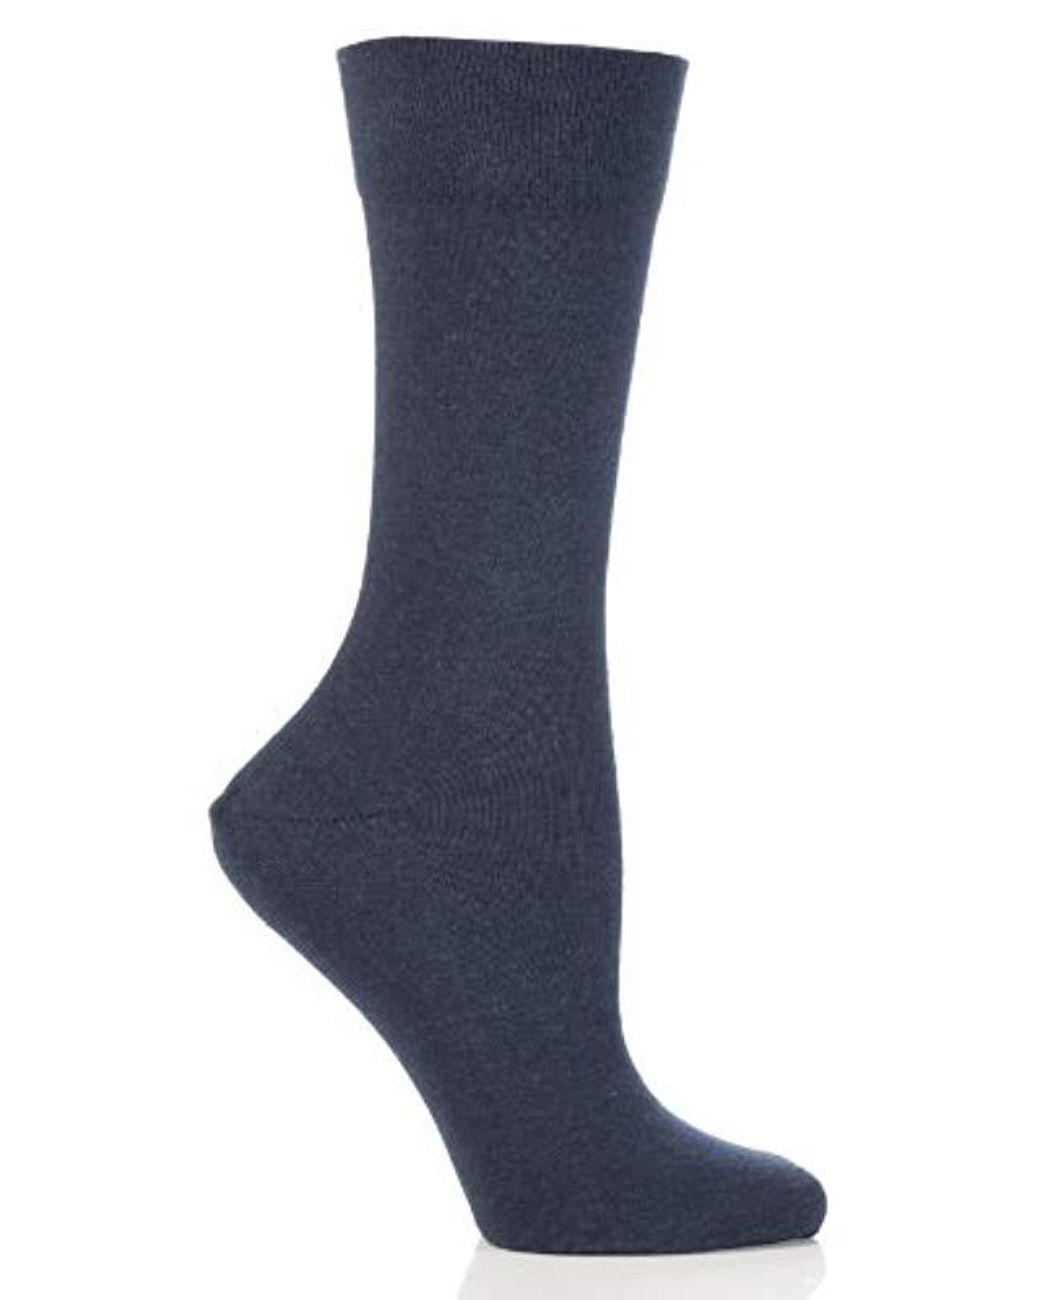 Falke Sensitive London Socks Navy